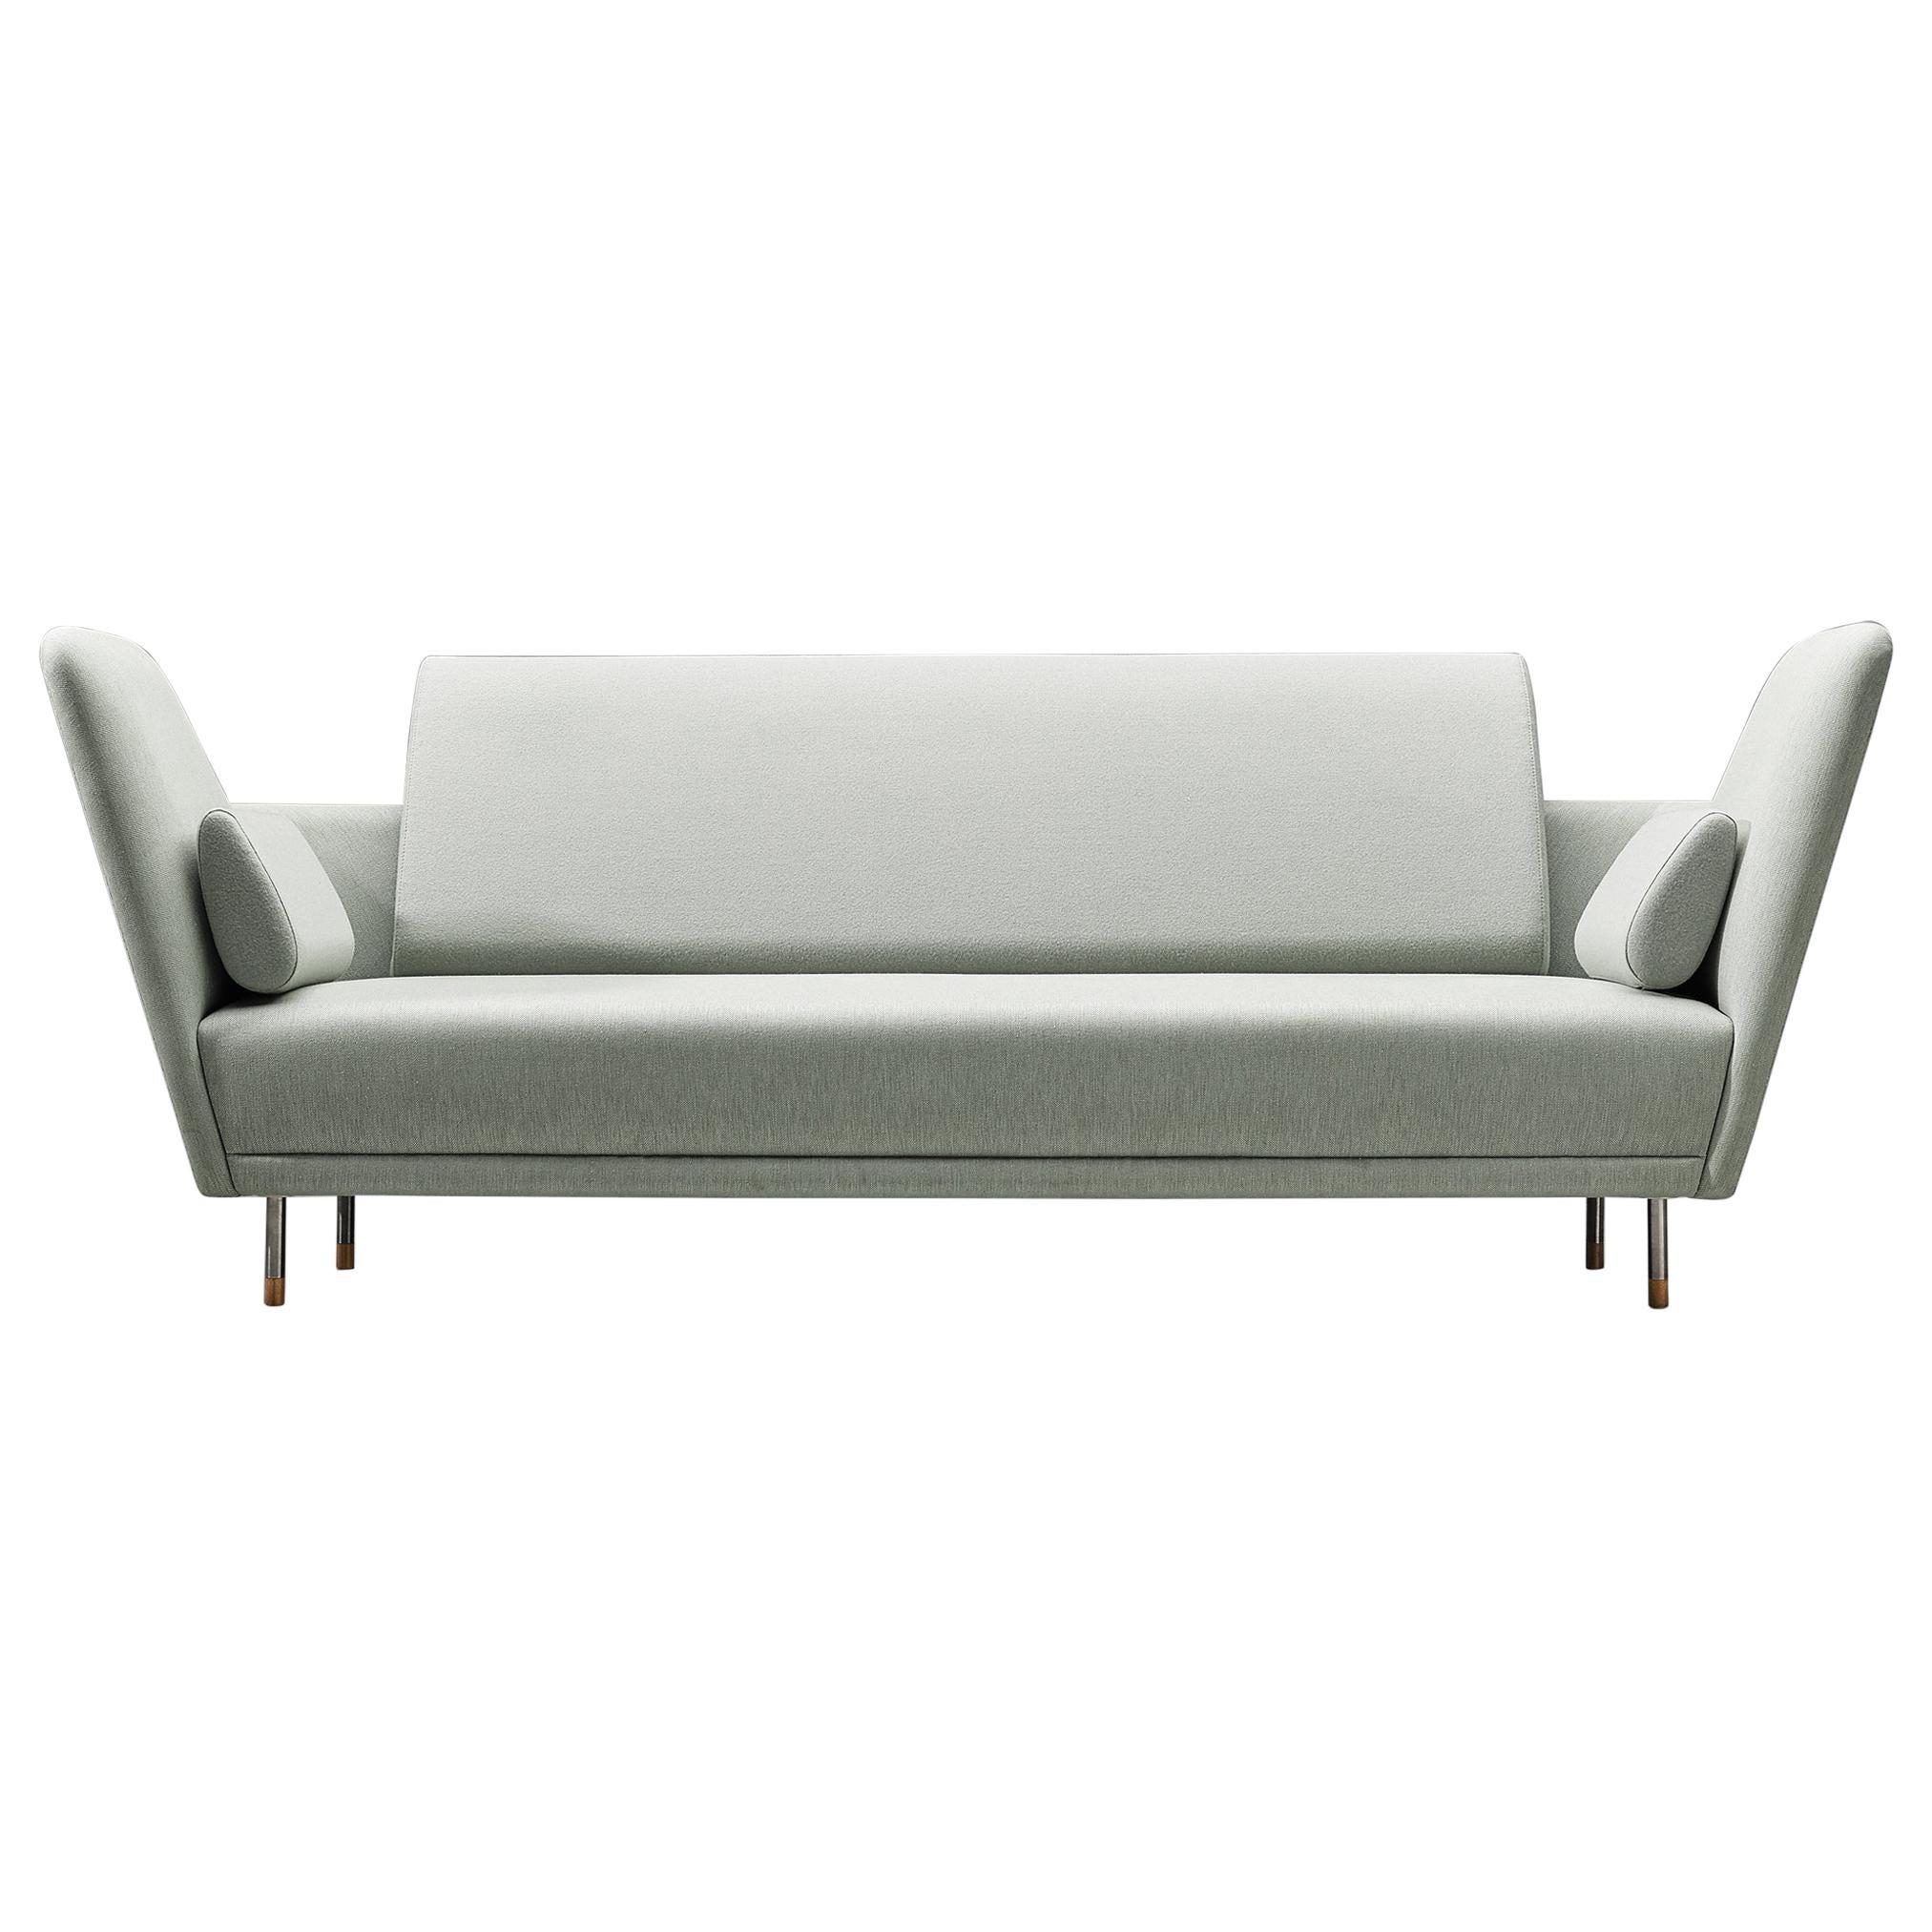 Finn Juhl Sofa '57' in Fabric Upholstery